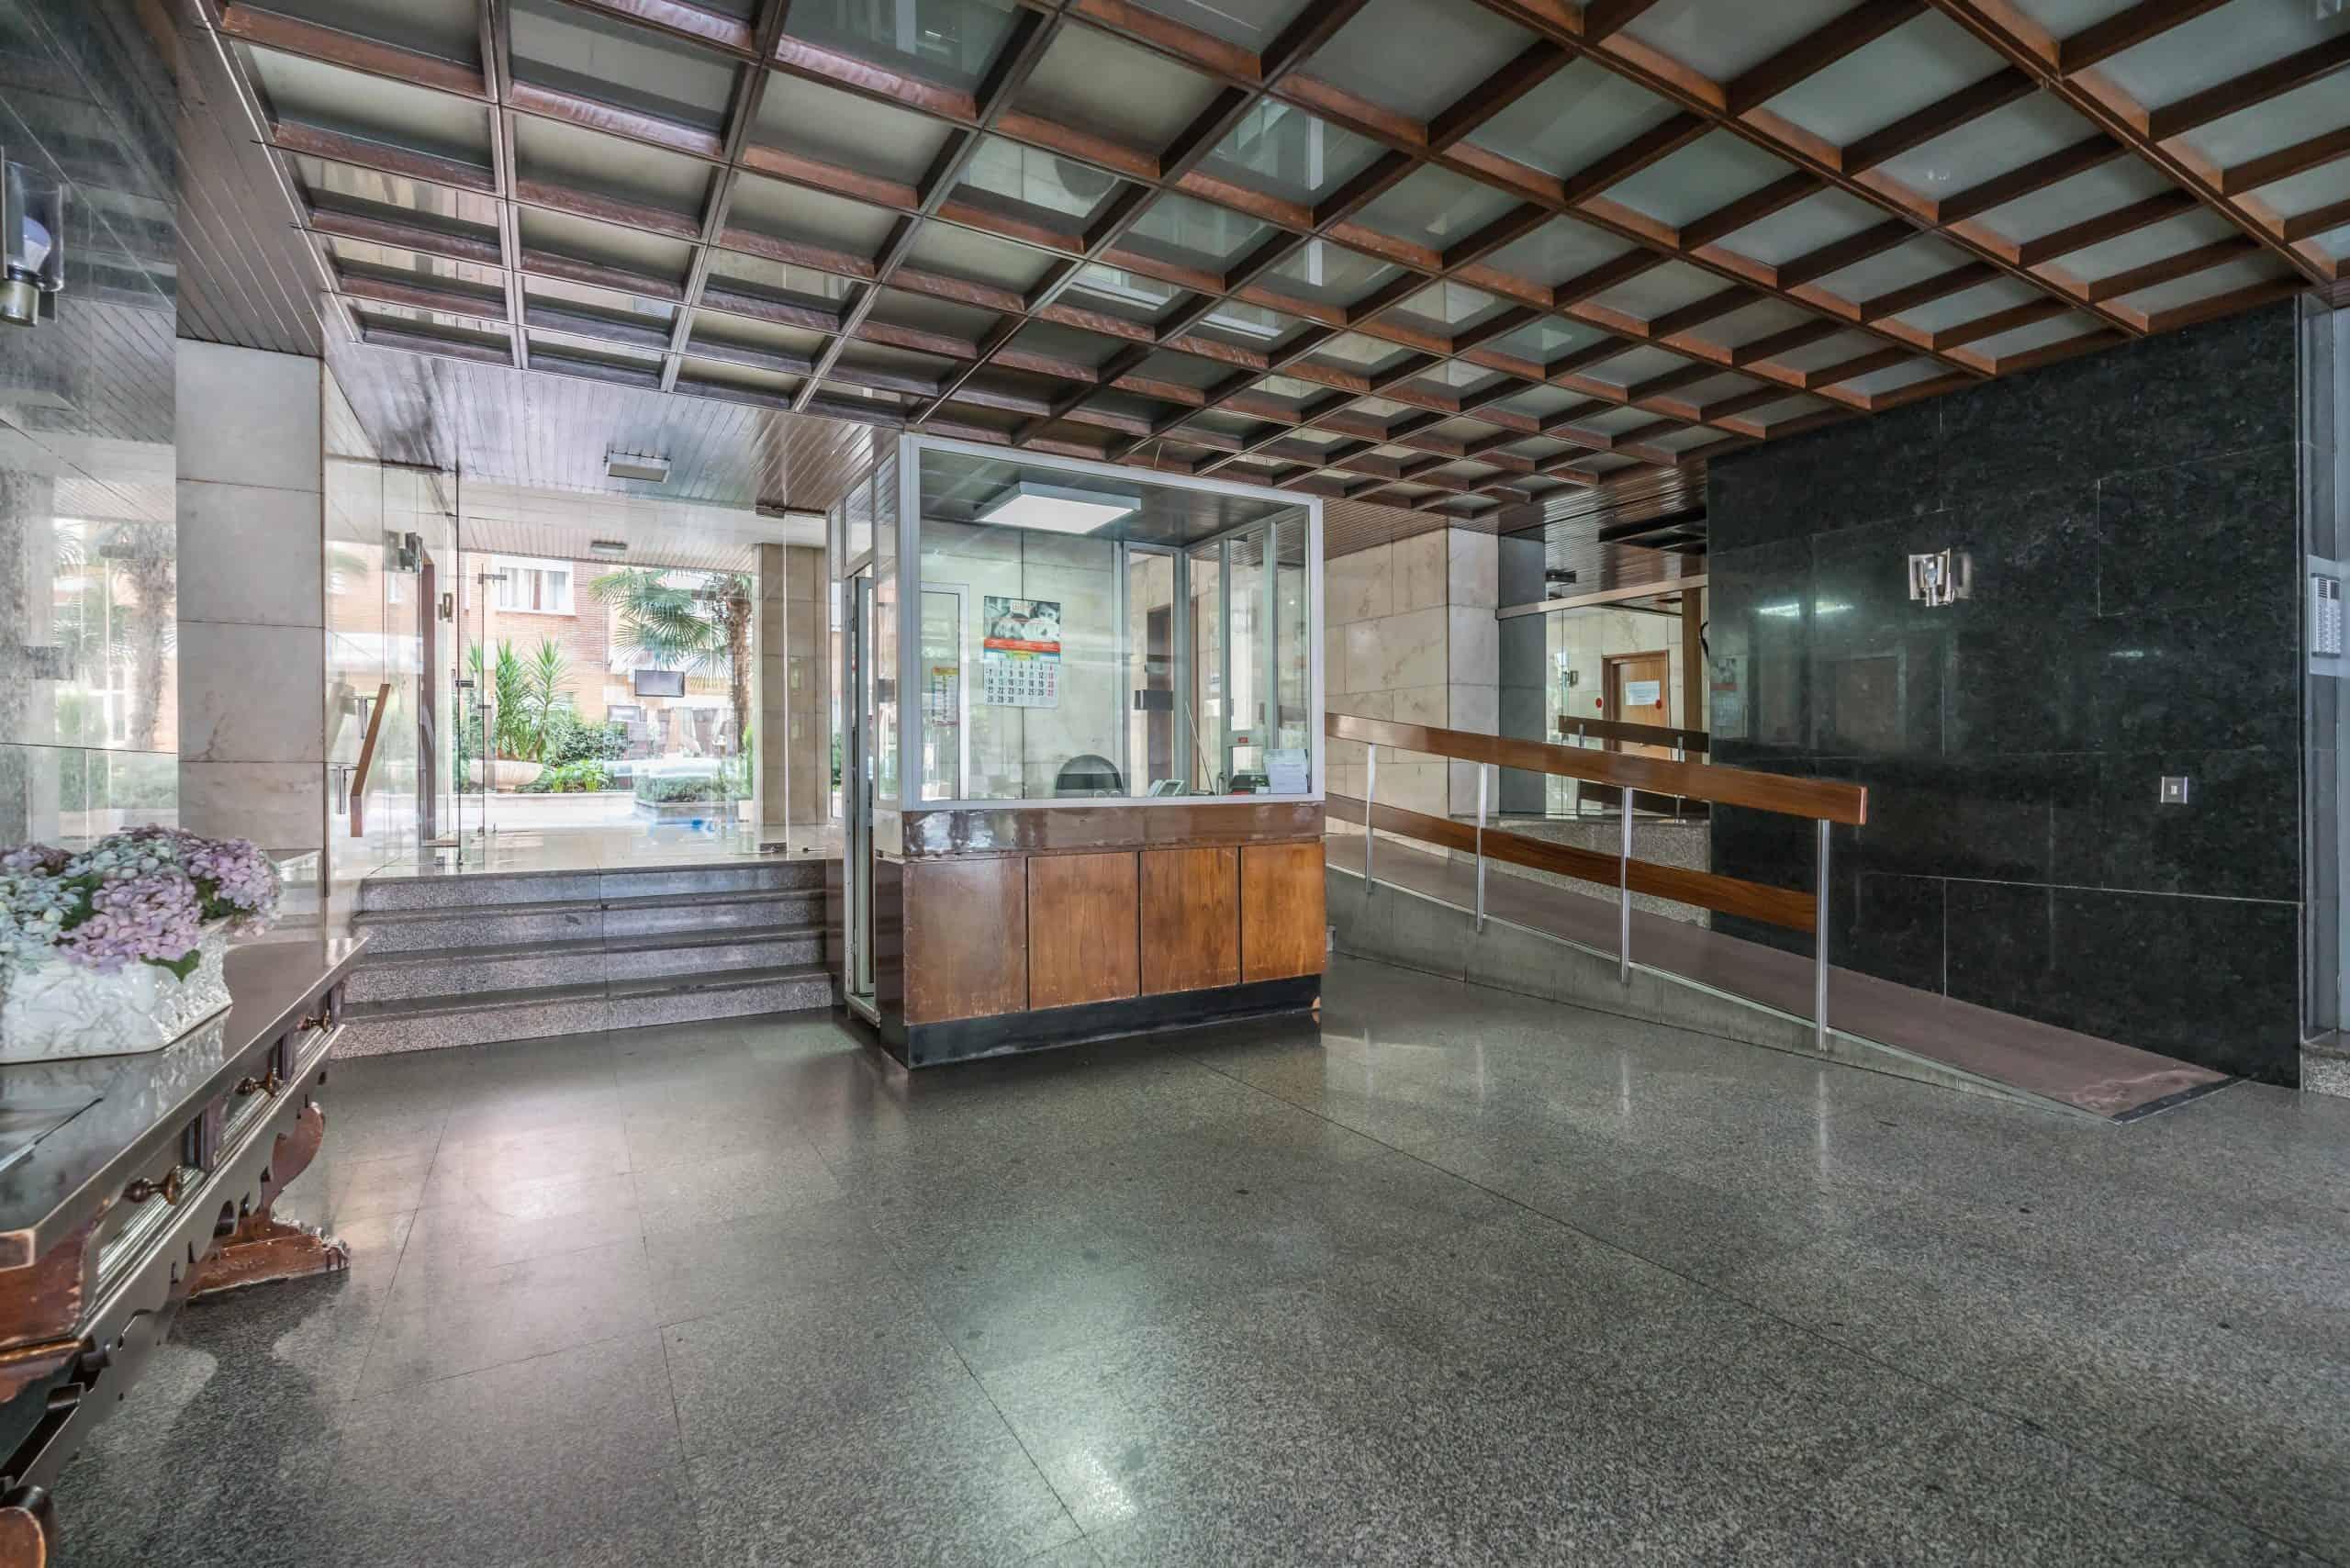 Agencia Inmobiliaria de Madrid-FUTUROCASA-Zona ARGANZUELA-EMBAJADORES-LEGAZPI -calle EMBAJADORES 108- ZONAS COMUNES (7)